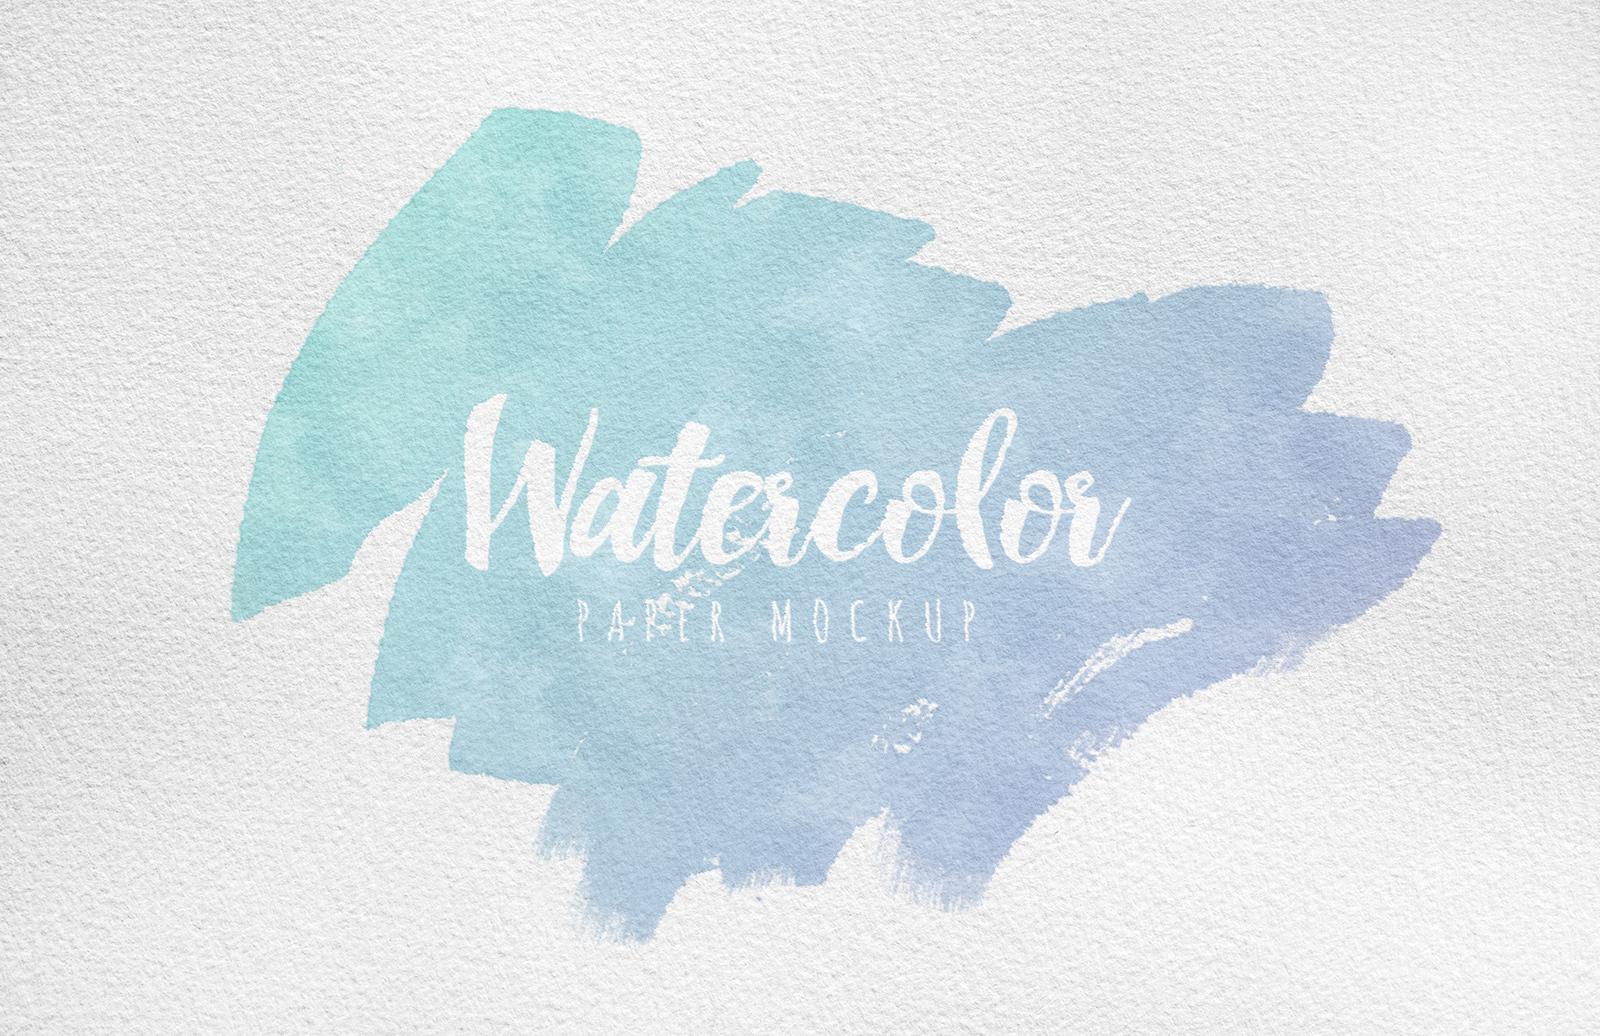 Watercolor Paper Mockup Preview 1